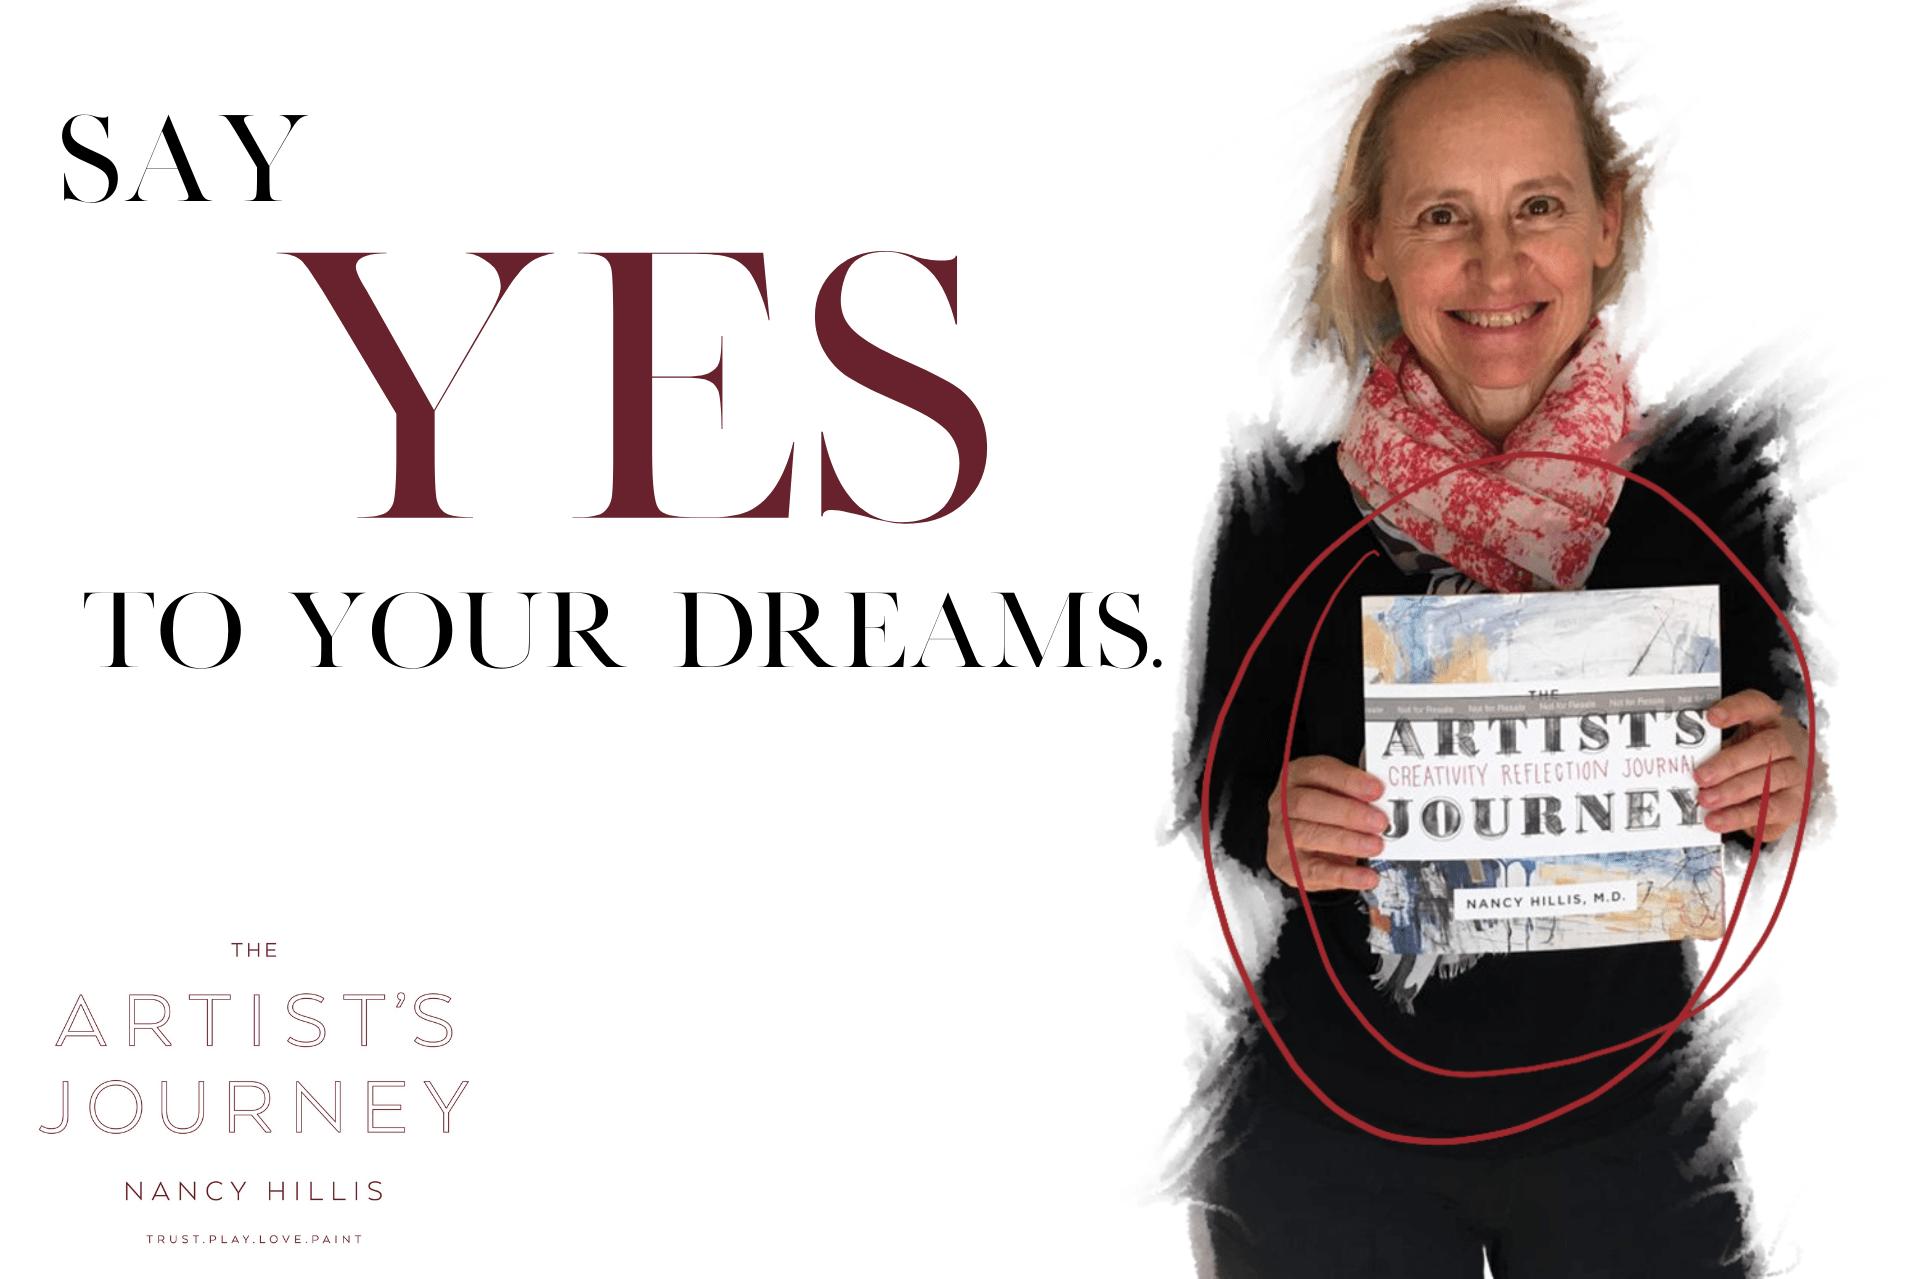 The Artist's Journey Creativity Reflection Journal- Nancy Hillis, MD